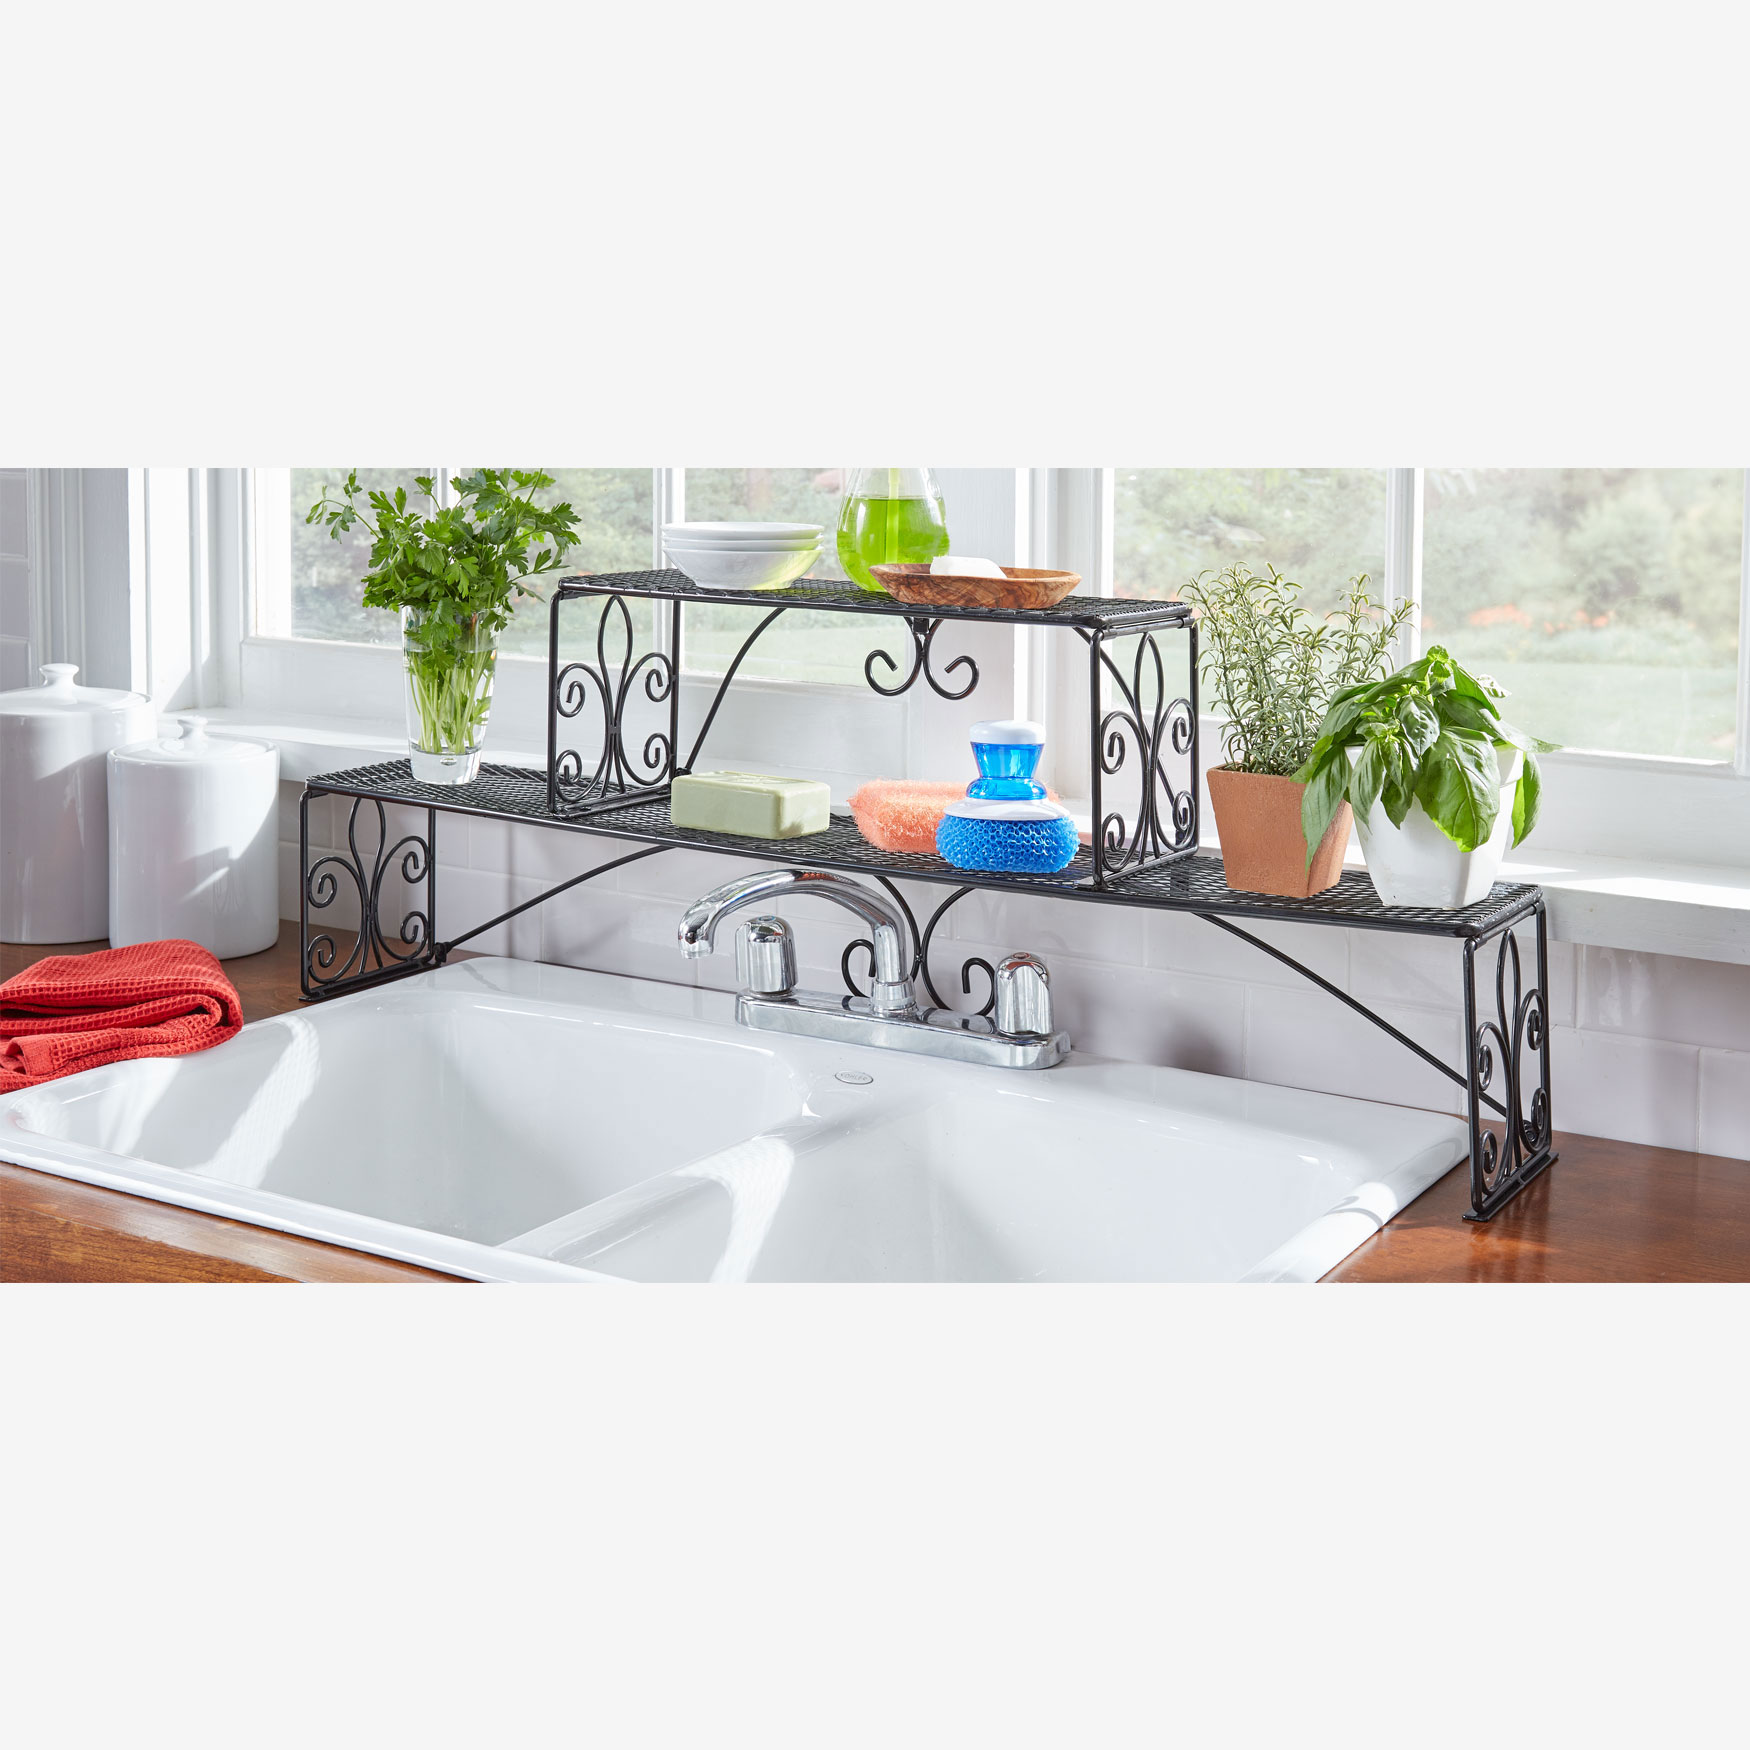 Brylane Home Kitchen: Scroll 2-Tier Over Sink Shelf